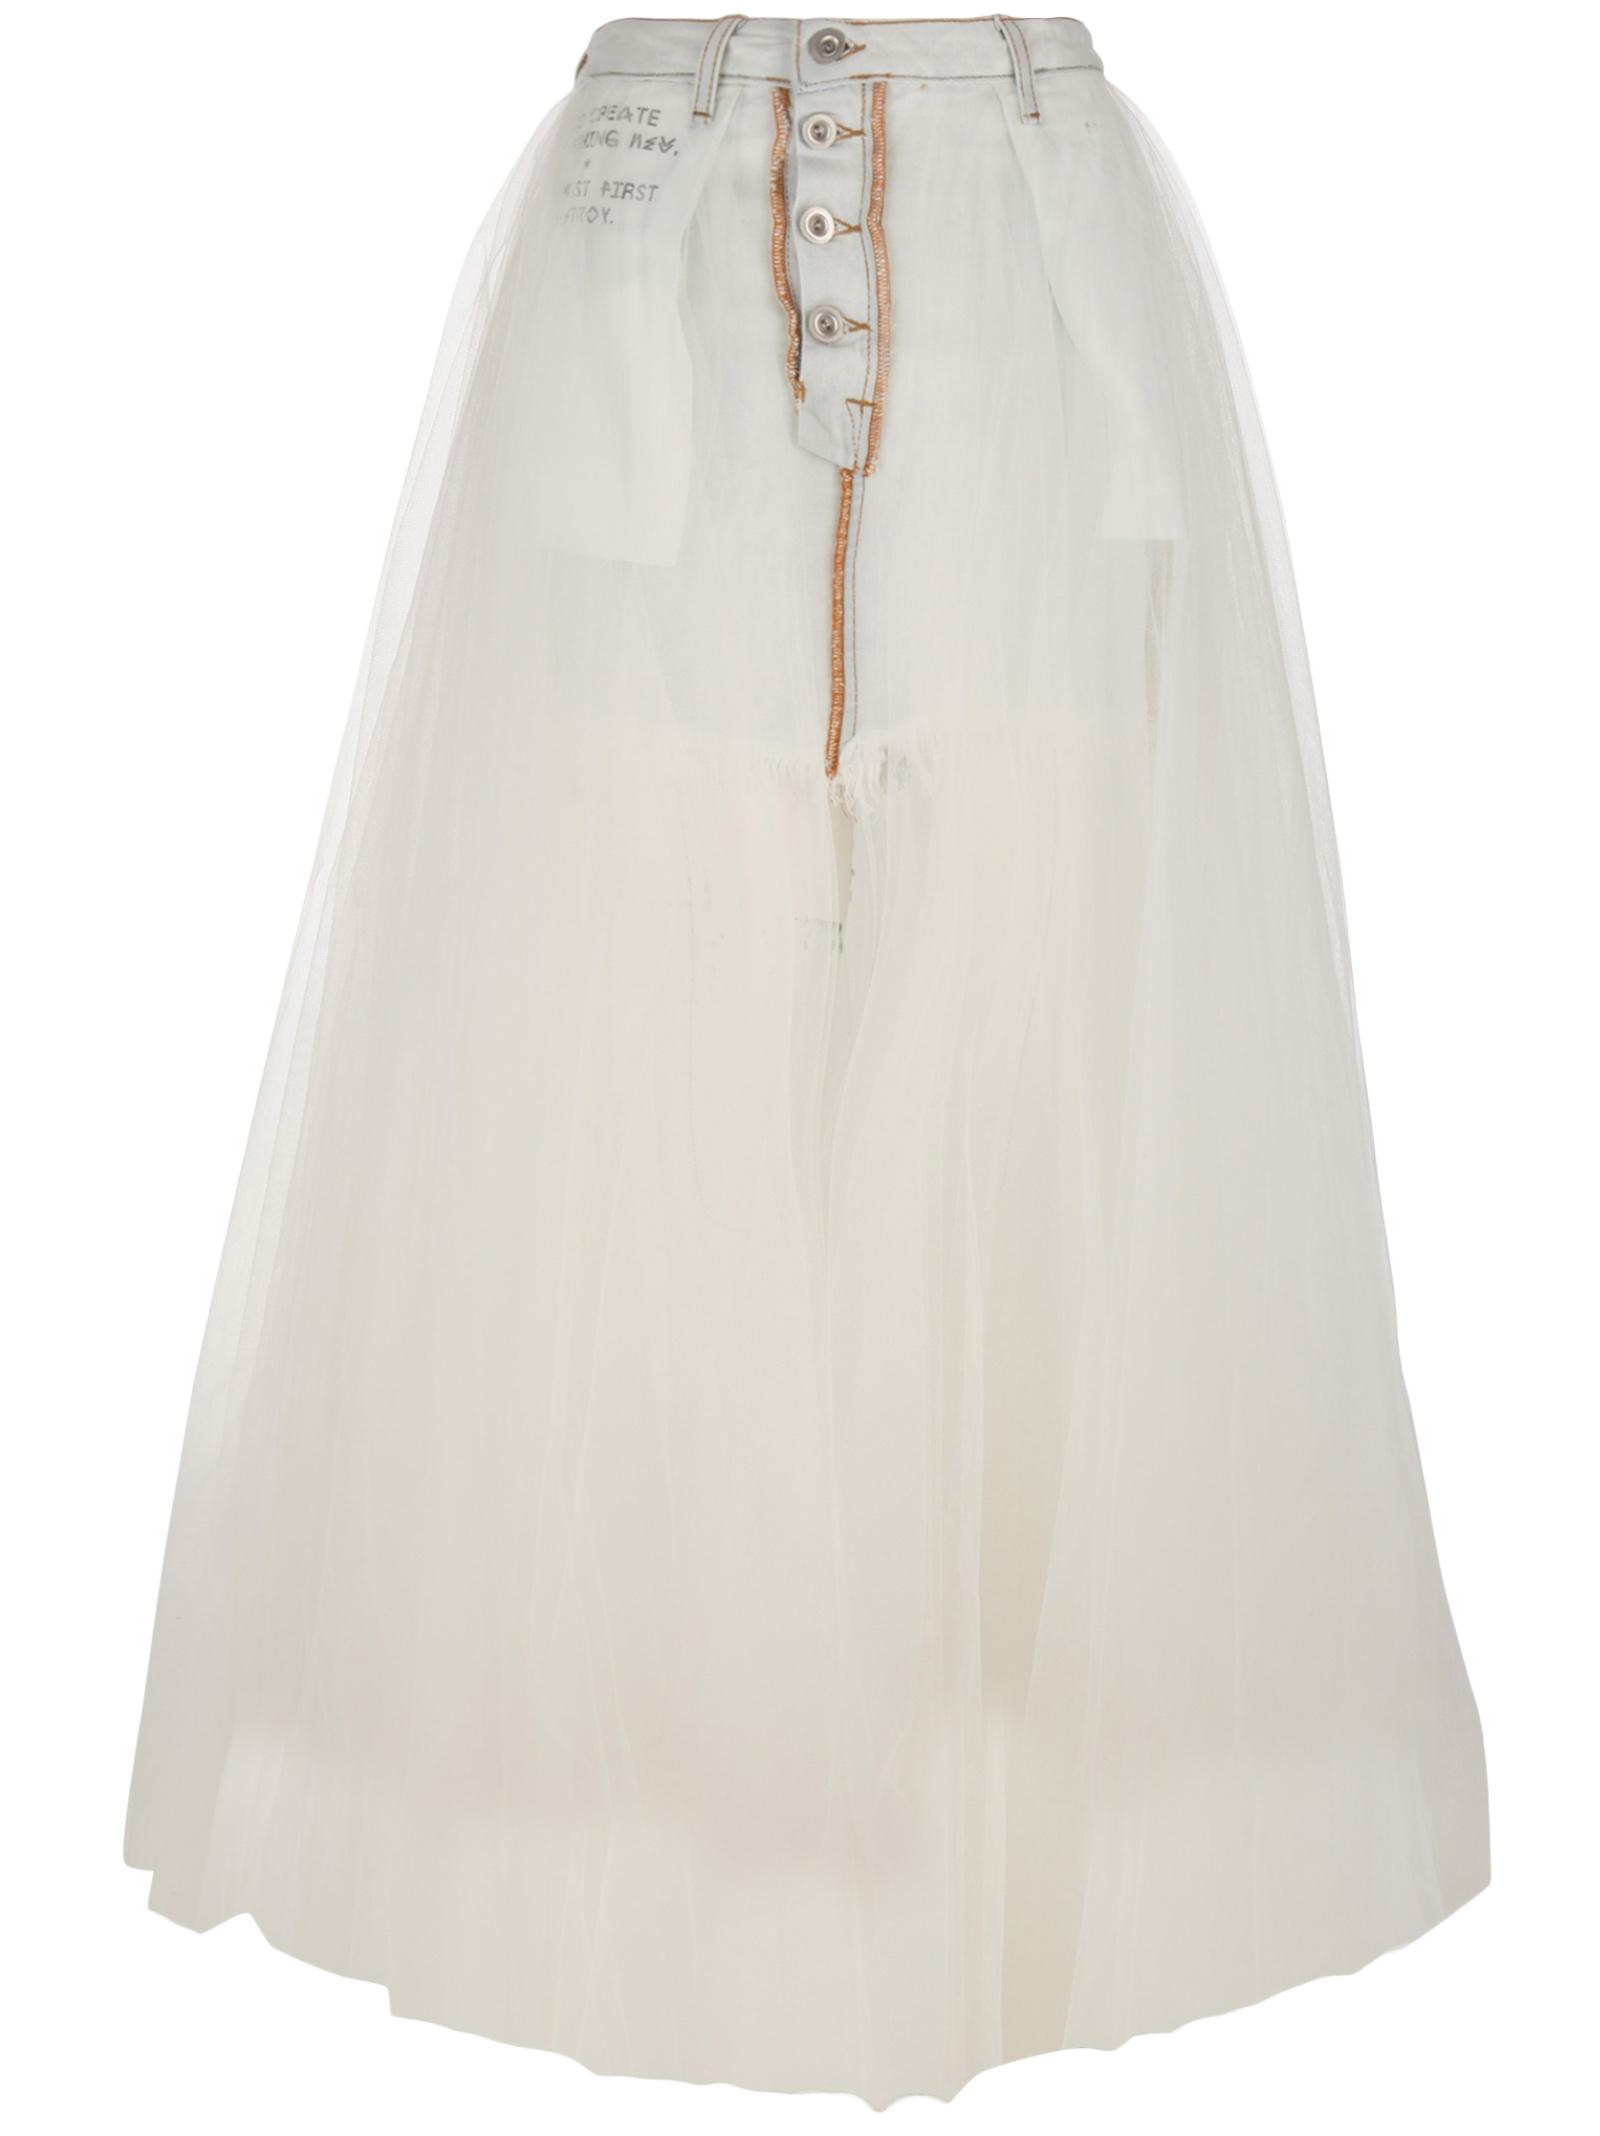 Ben Taverniti Unravel Project skirt